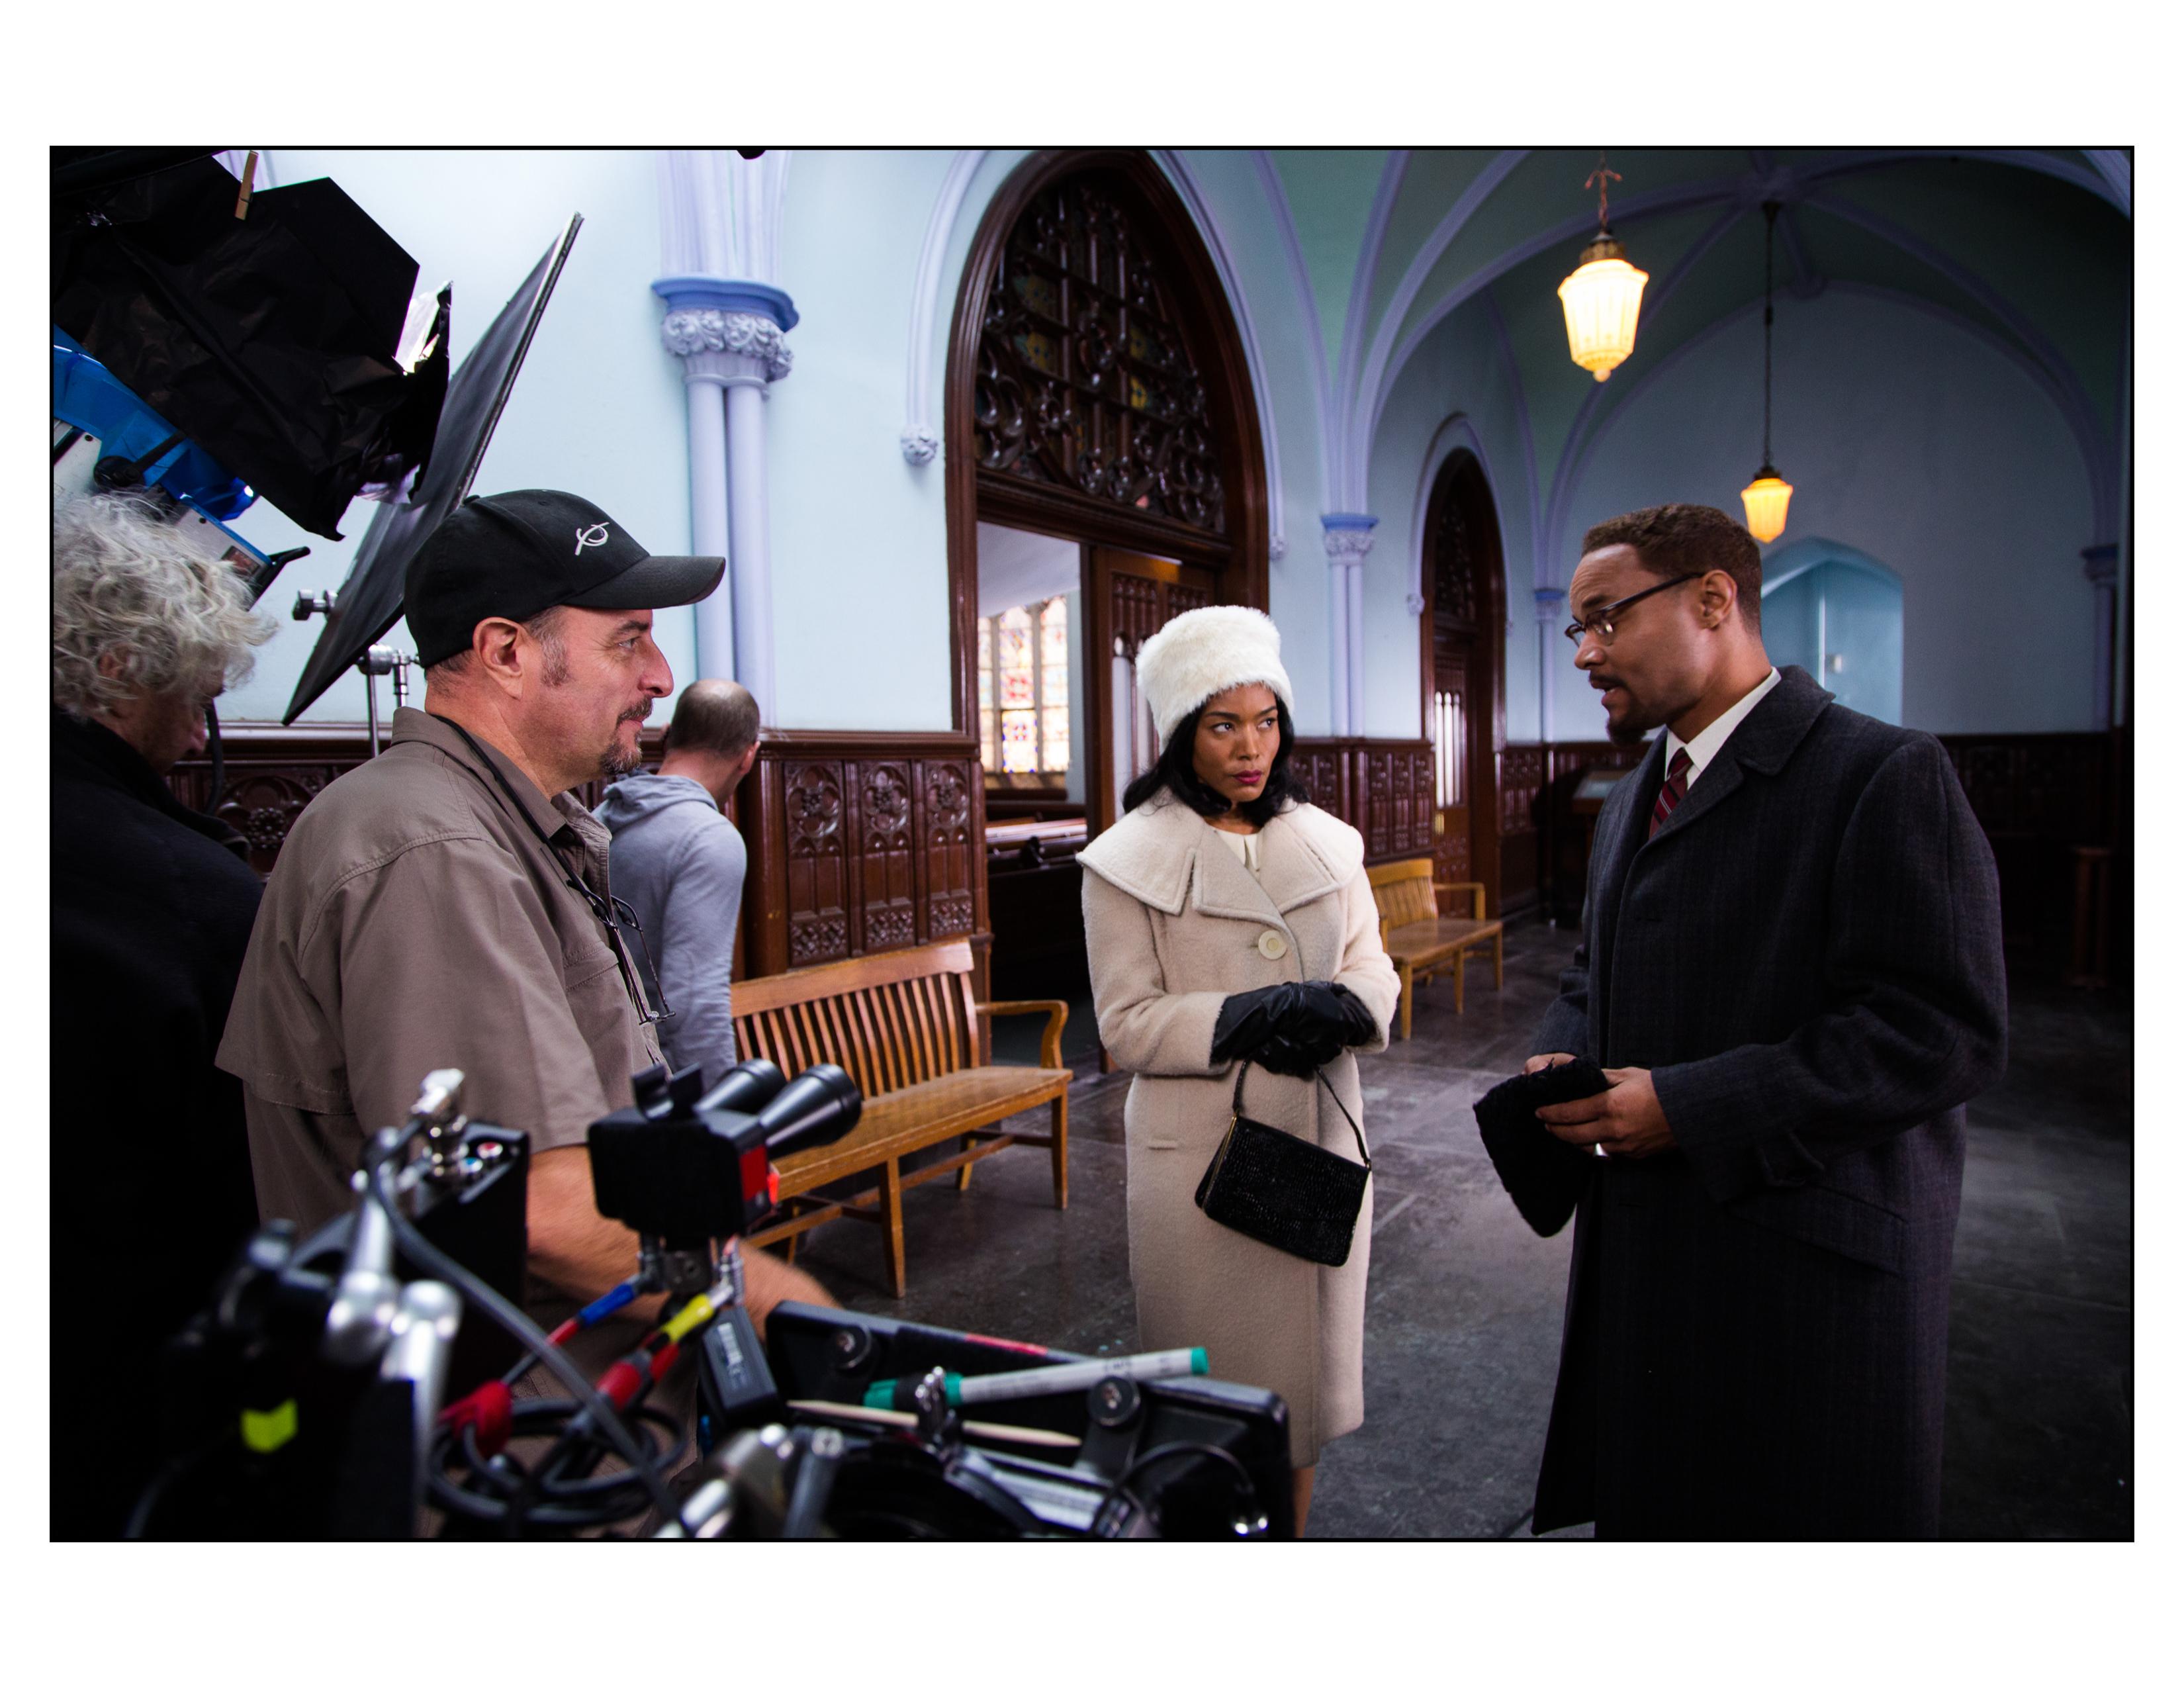 Behind the scenes on set of Betty & Coretta. With Lindsay Owen Pierre (Malcom X), Angela Bassett (Coretta King) and director Yves Simoneau